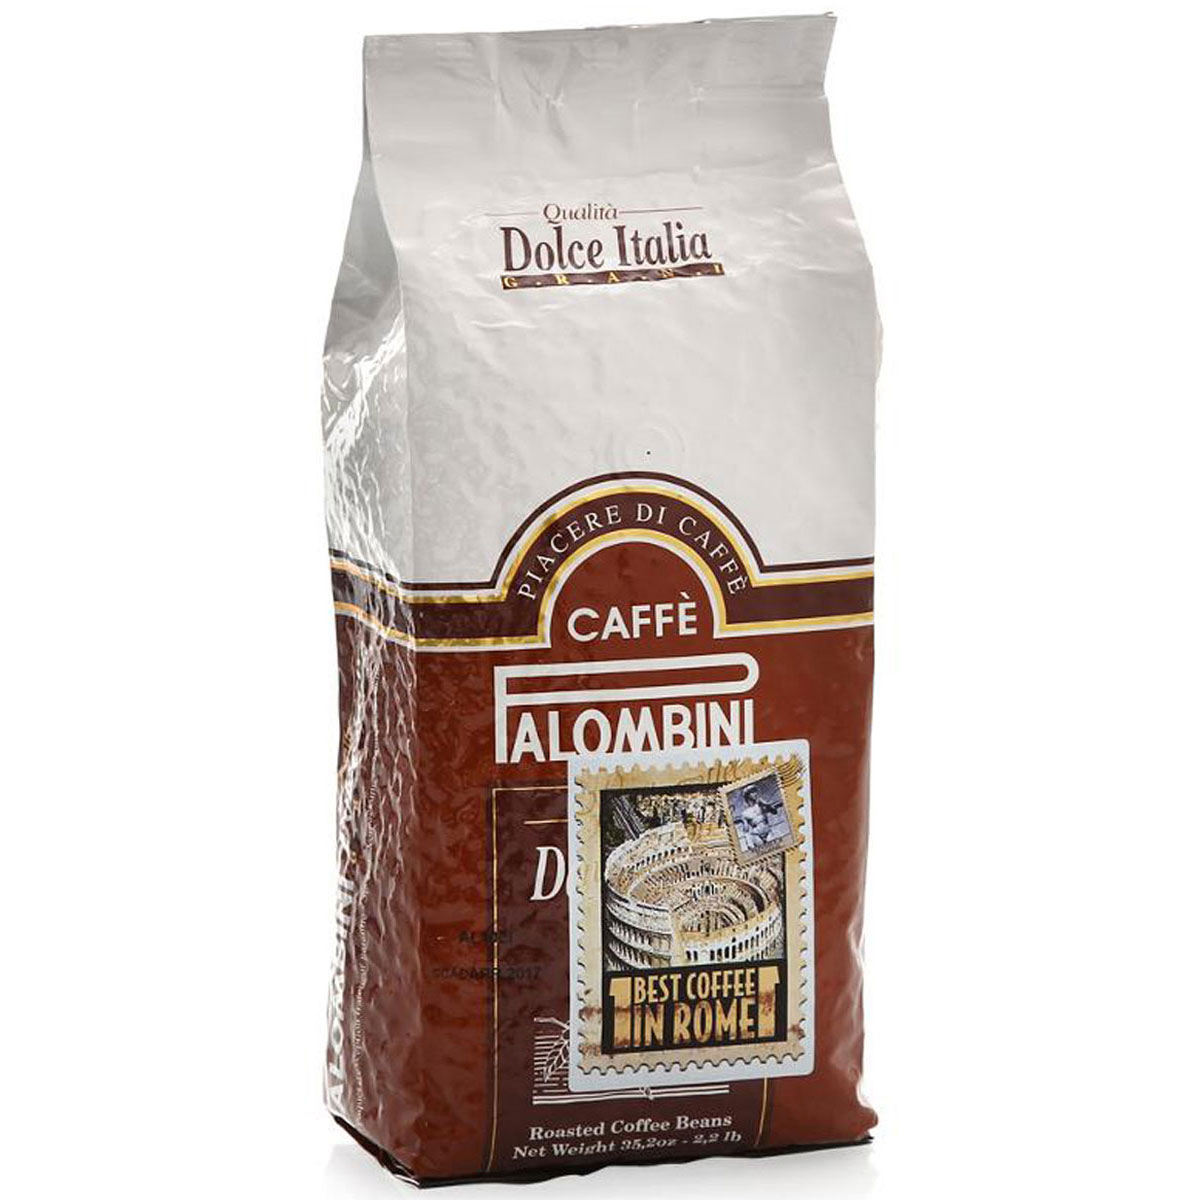 Palombini Dolce Italia кофе в зернах, 1 кг рубашка piazza italia piazza italia pi022emstc34